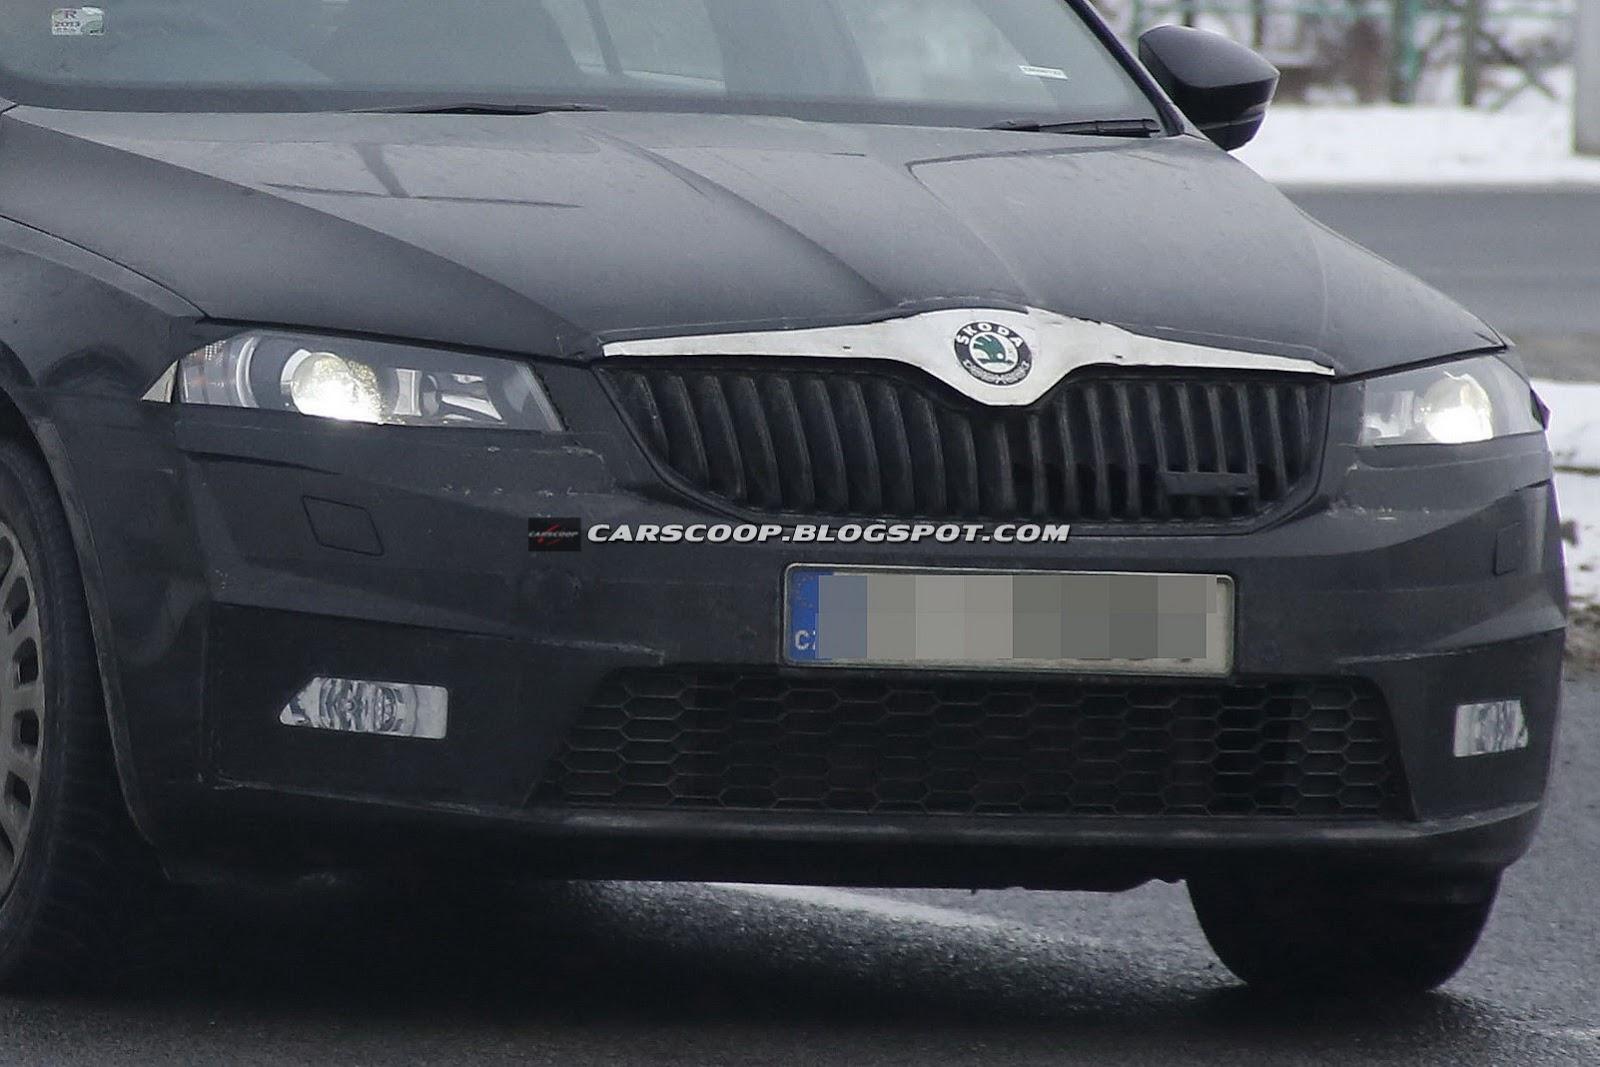 New Skoda Octavia Combi RS Spied (Images)